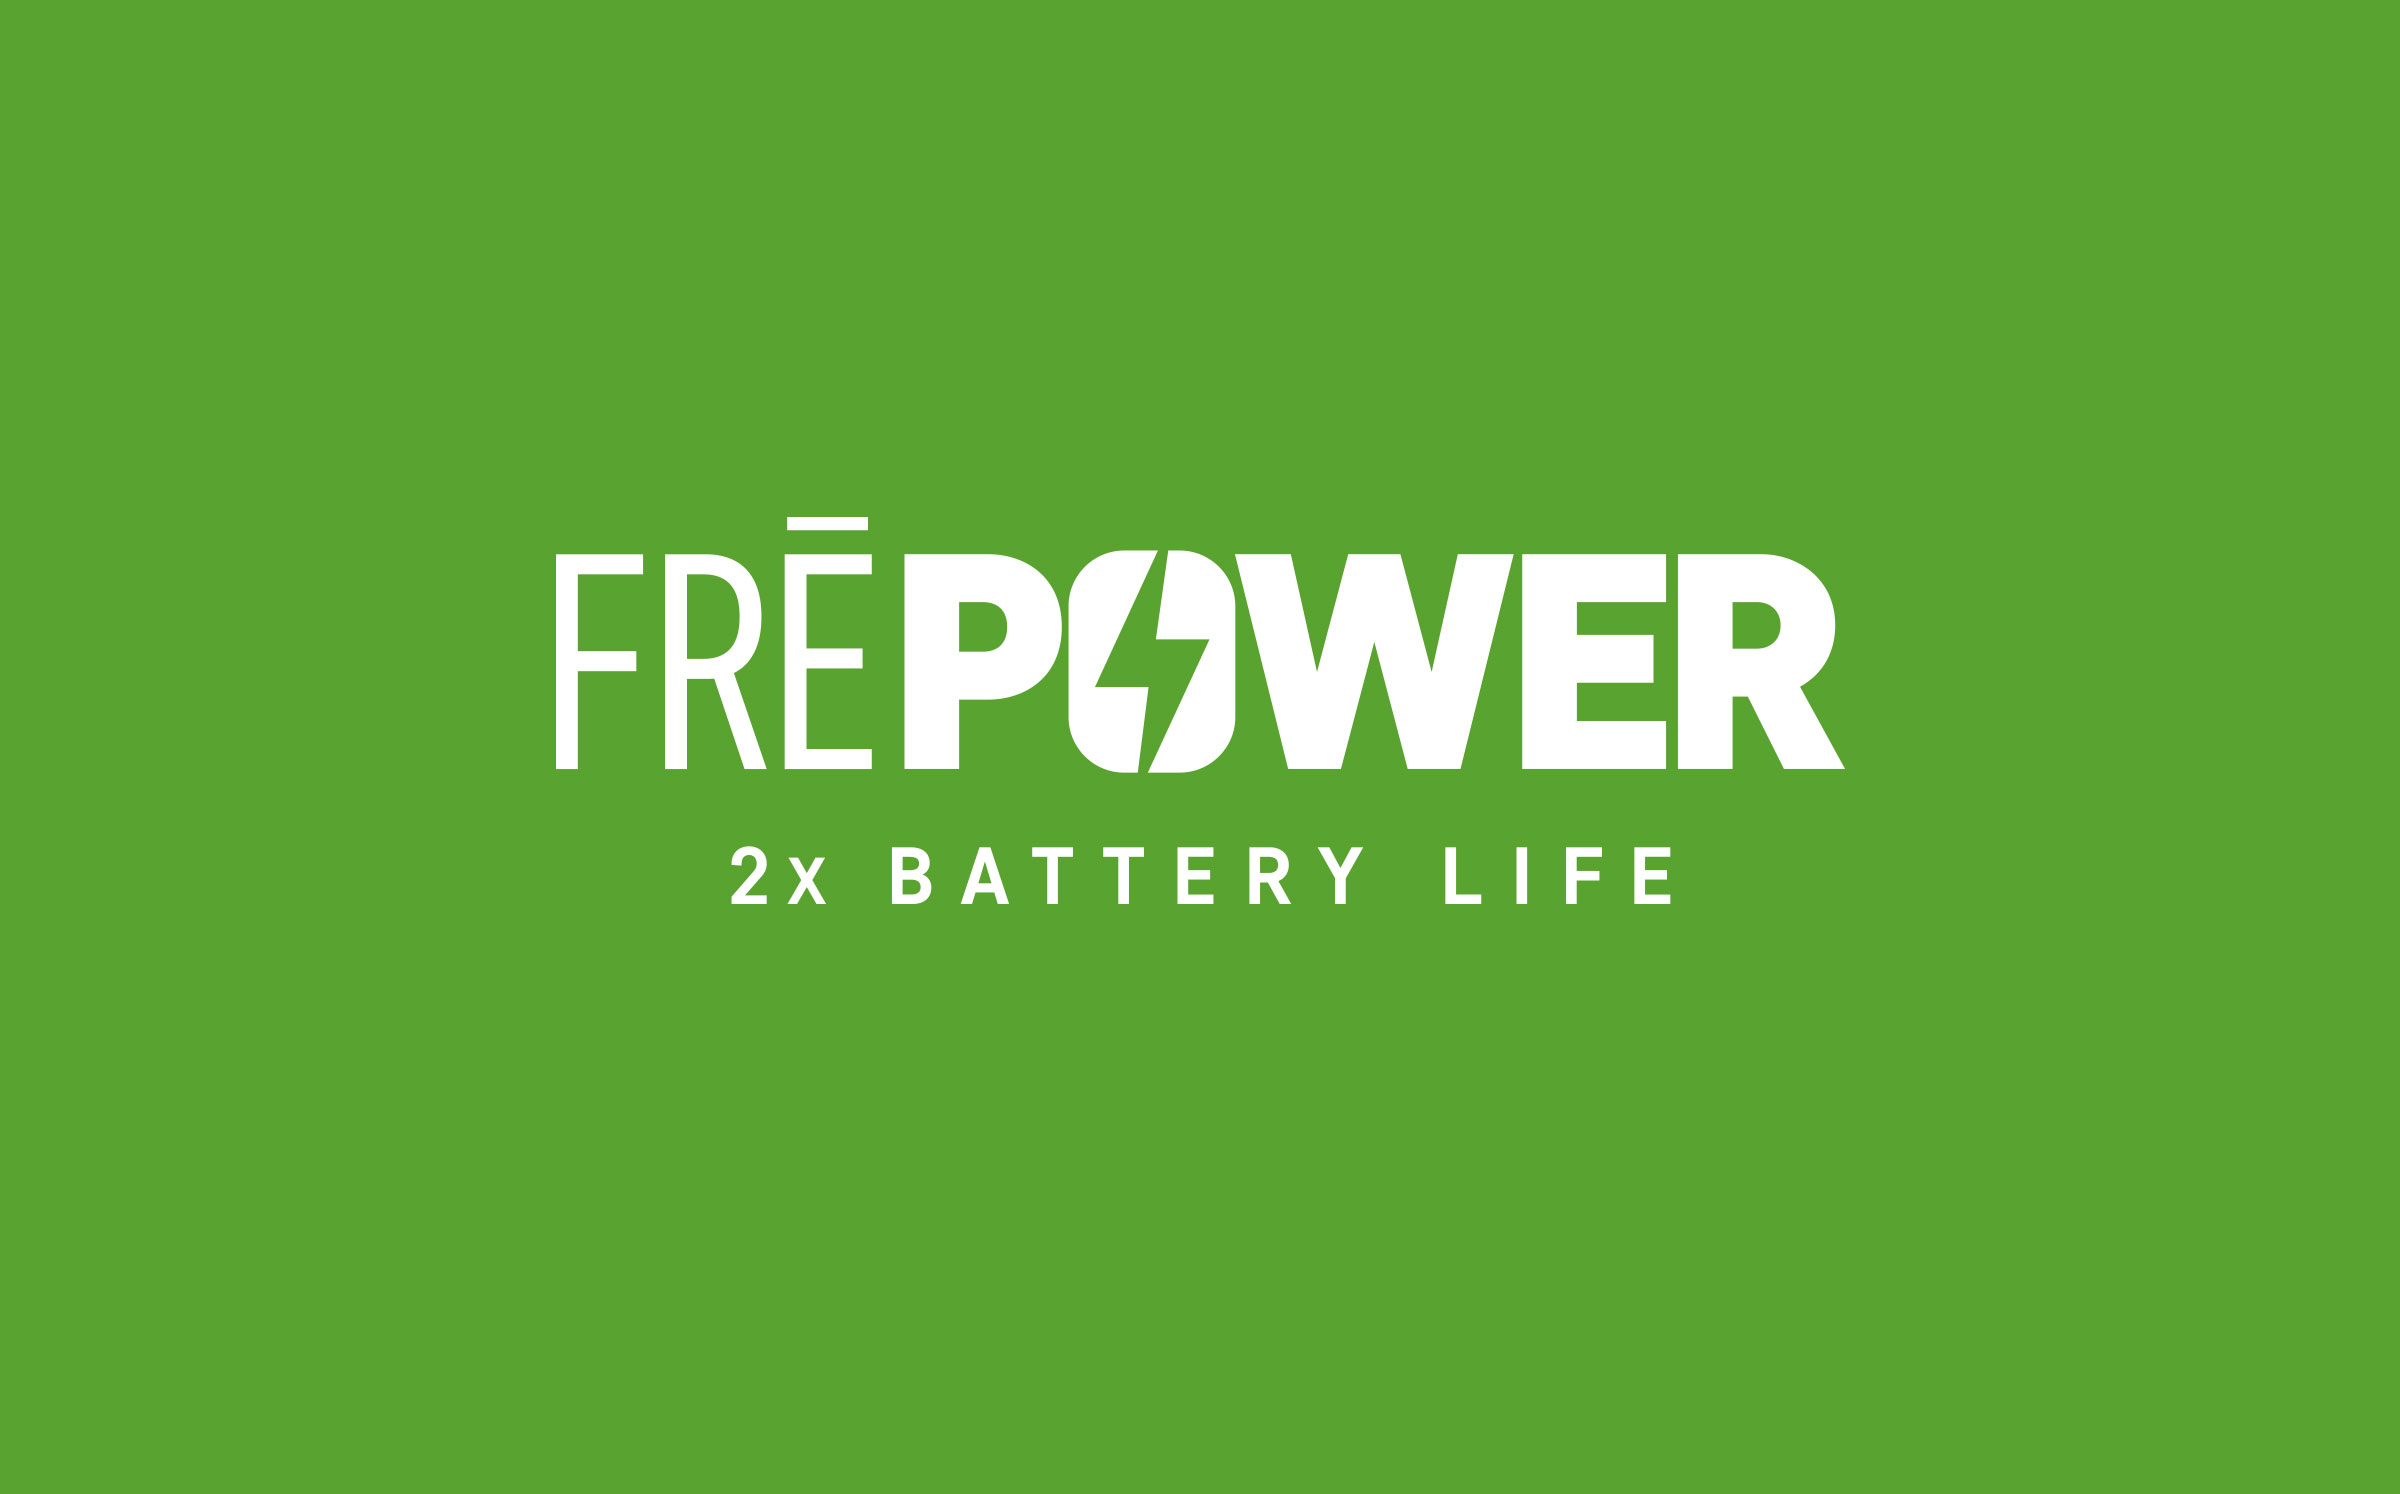 FrePower_Logo.jpg